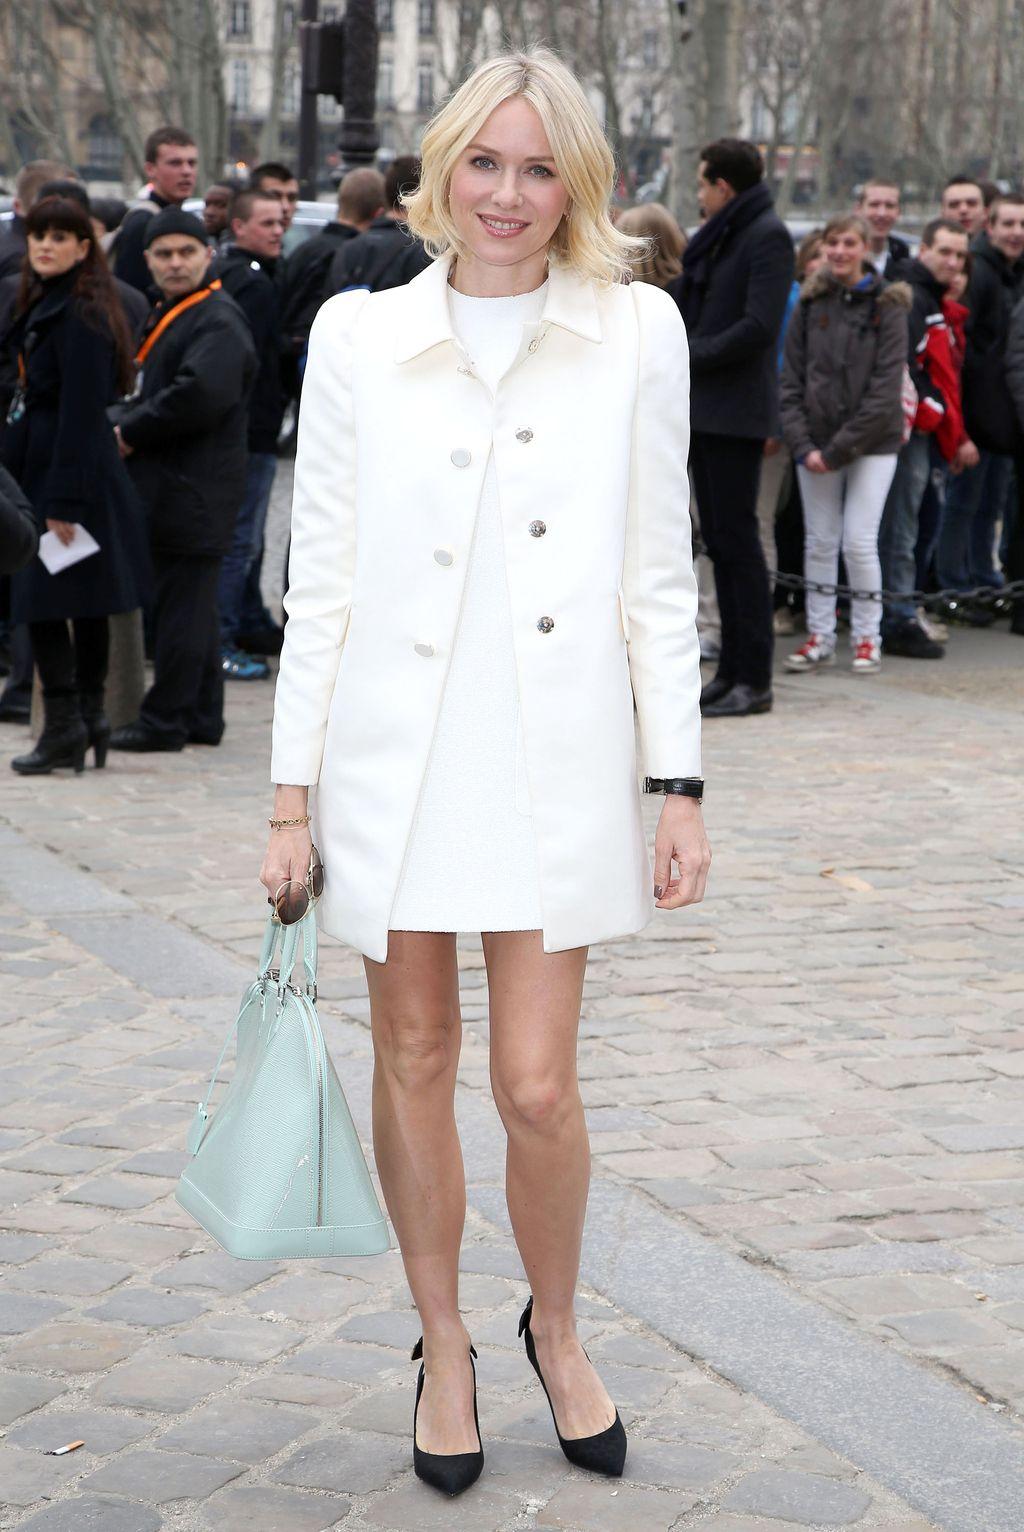 Naomi Watts At The Louis Vuitton F/W 2013 Show Paris Fashion Show